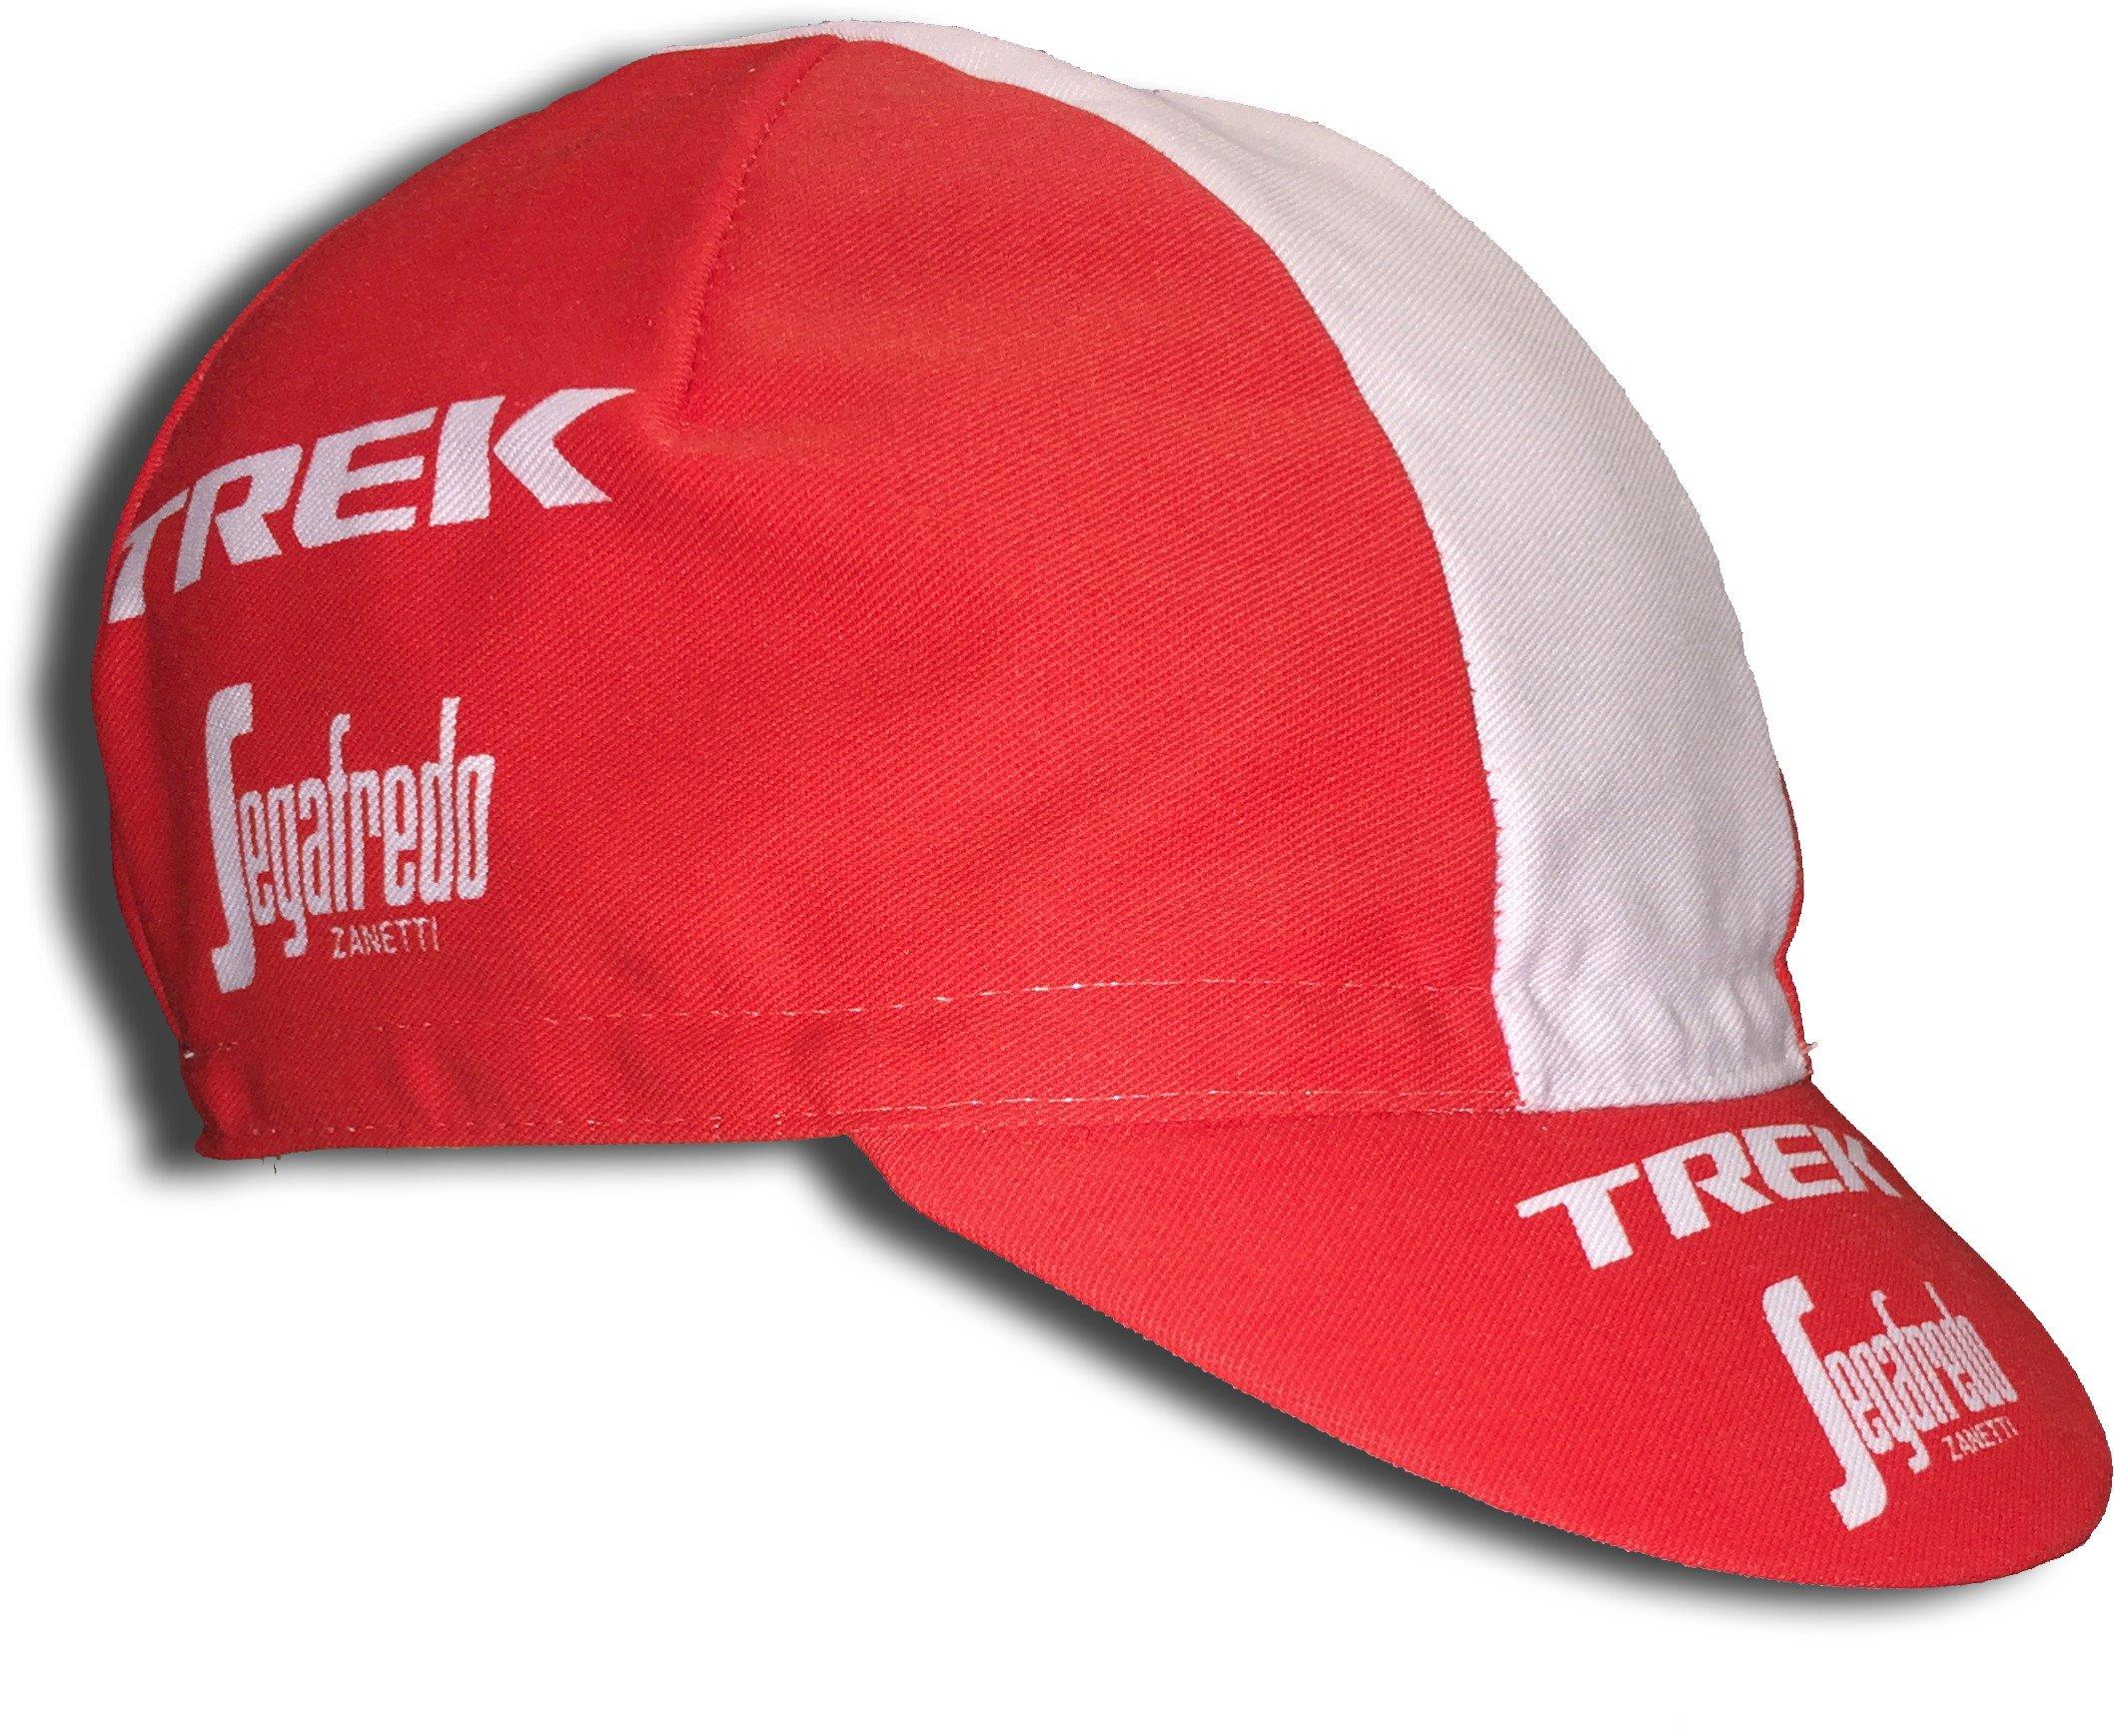 Retro Prestige Team Cycling Caps (Trek Segafredo)